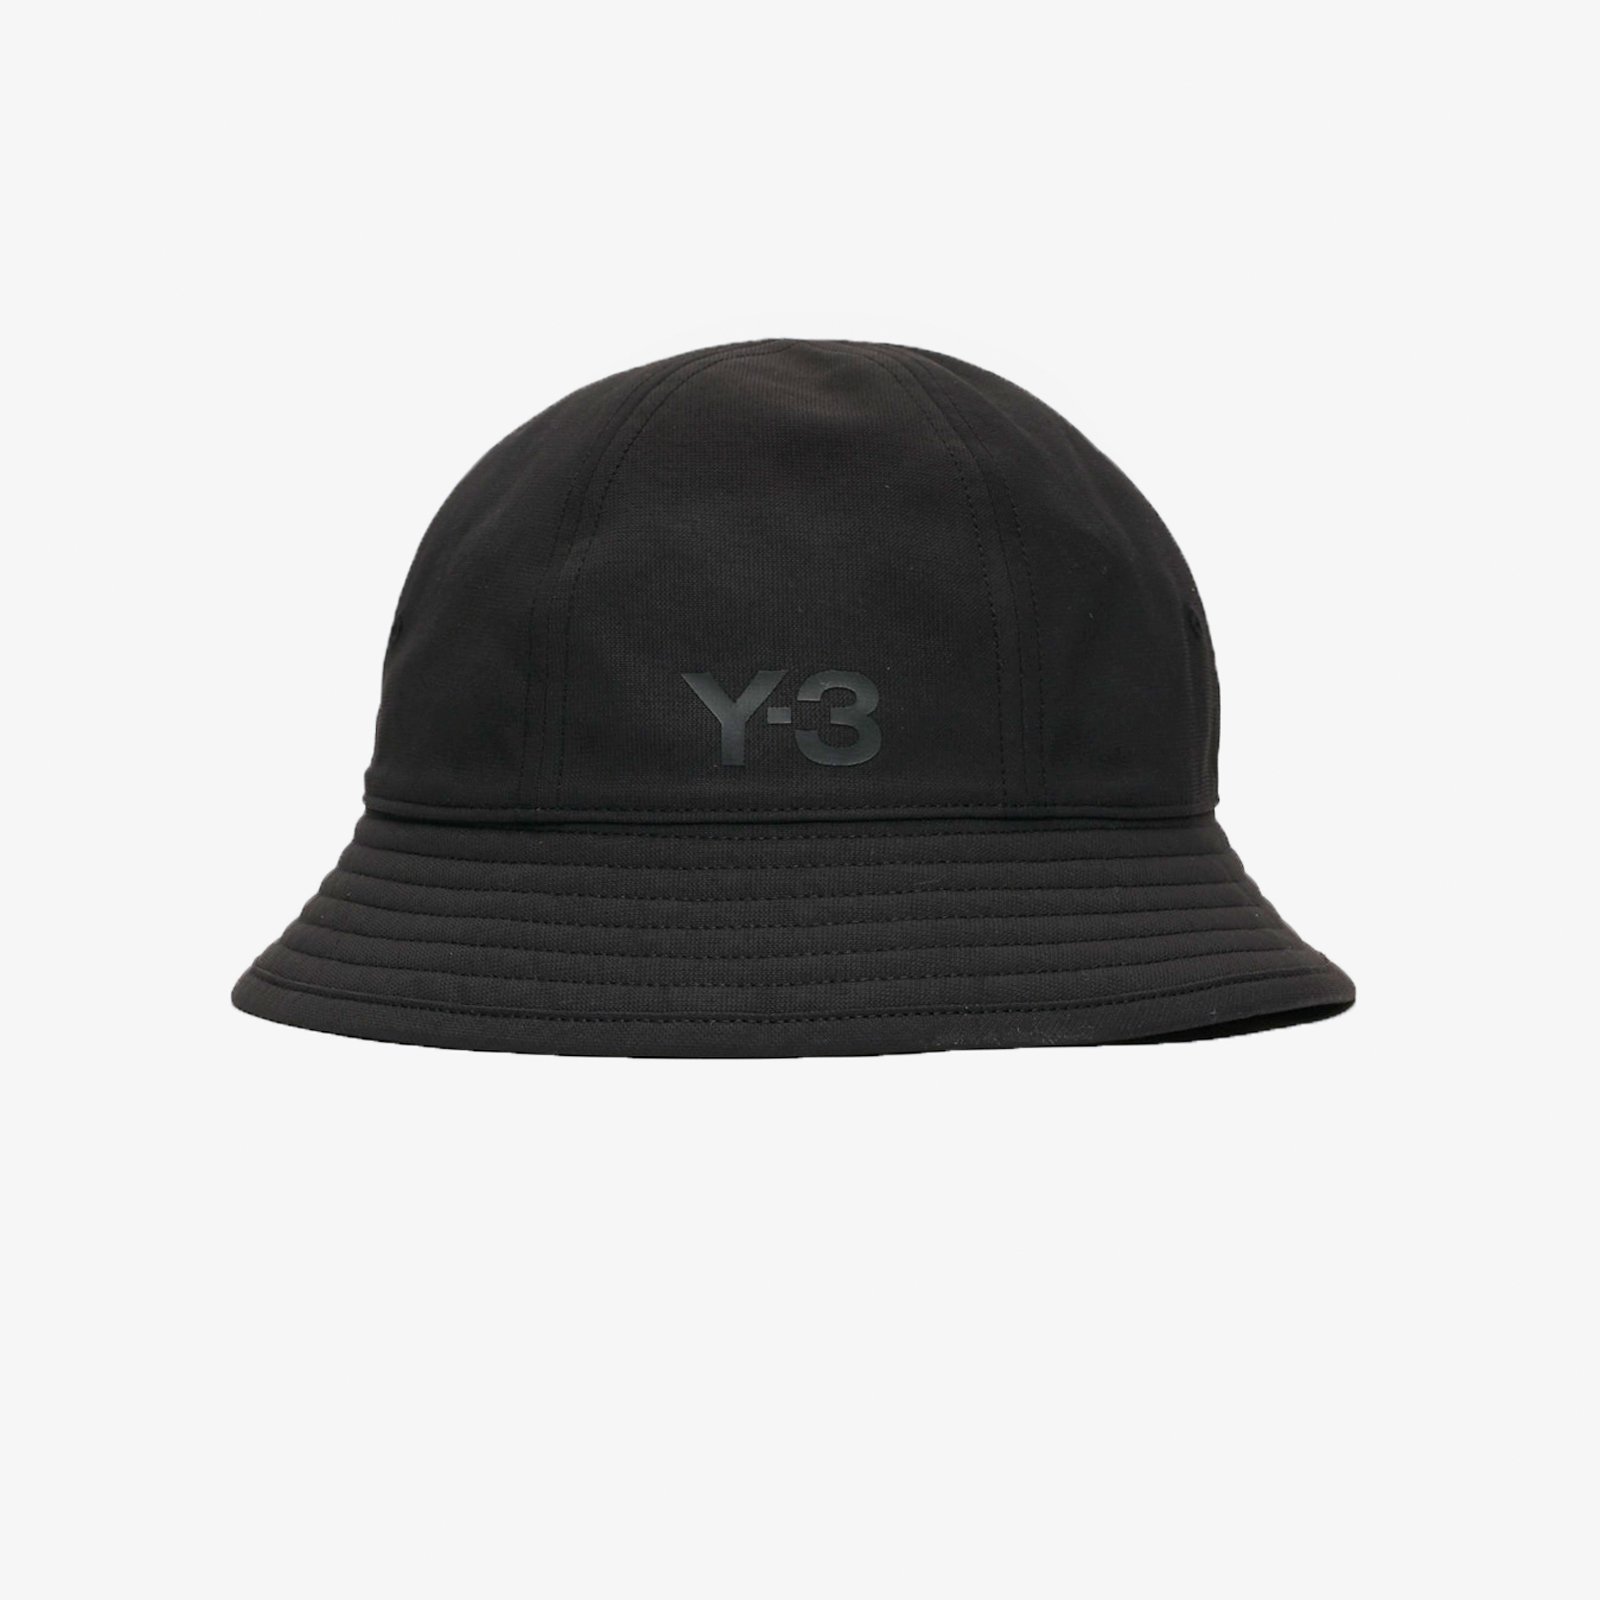 adidas Y-3 Bucket Hat - Dy0527 - Sneakersnstuff  ff0e47bd9c25